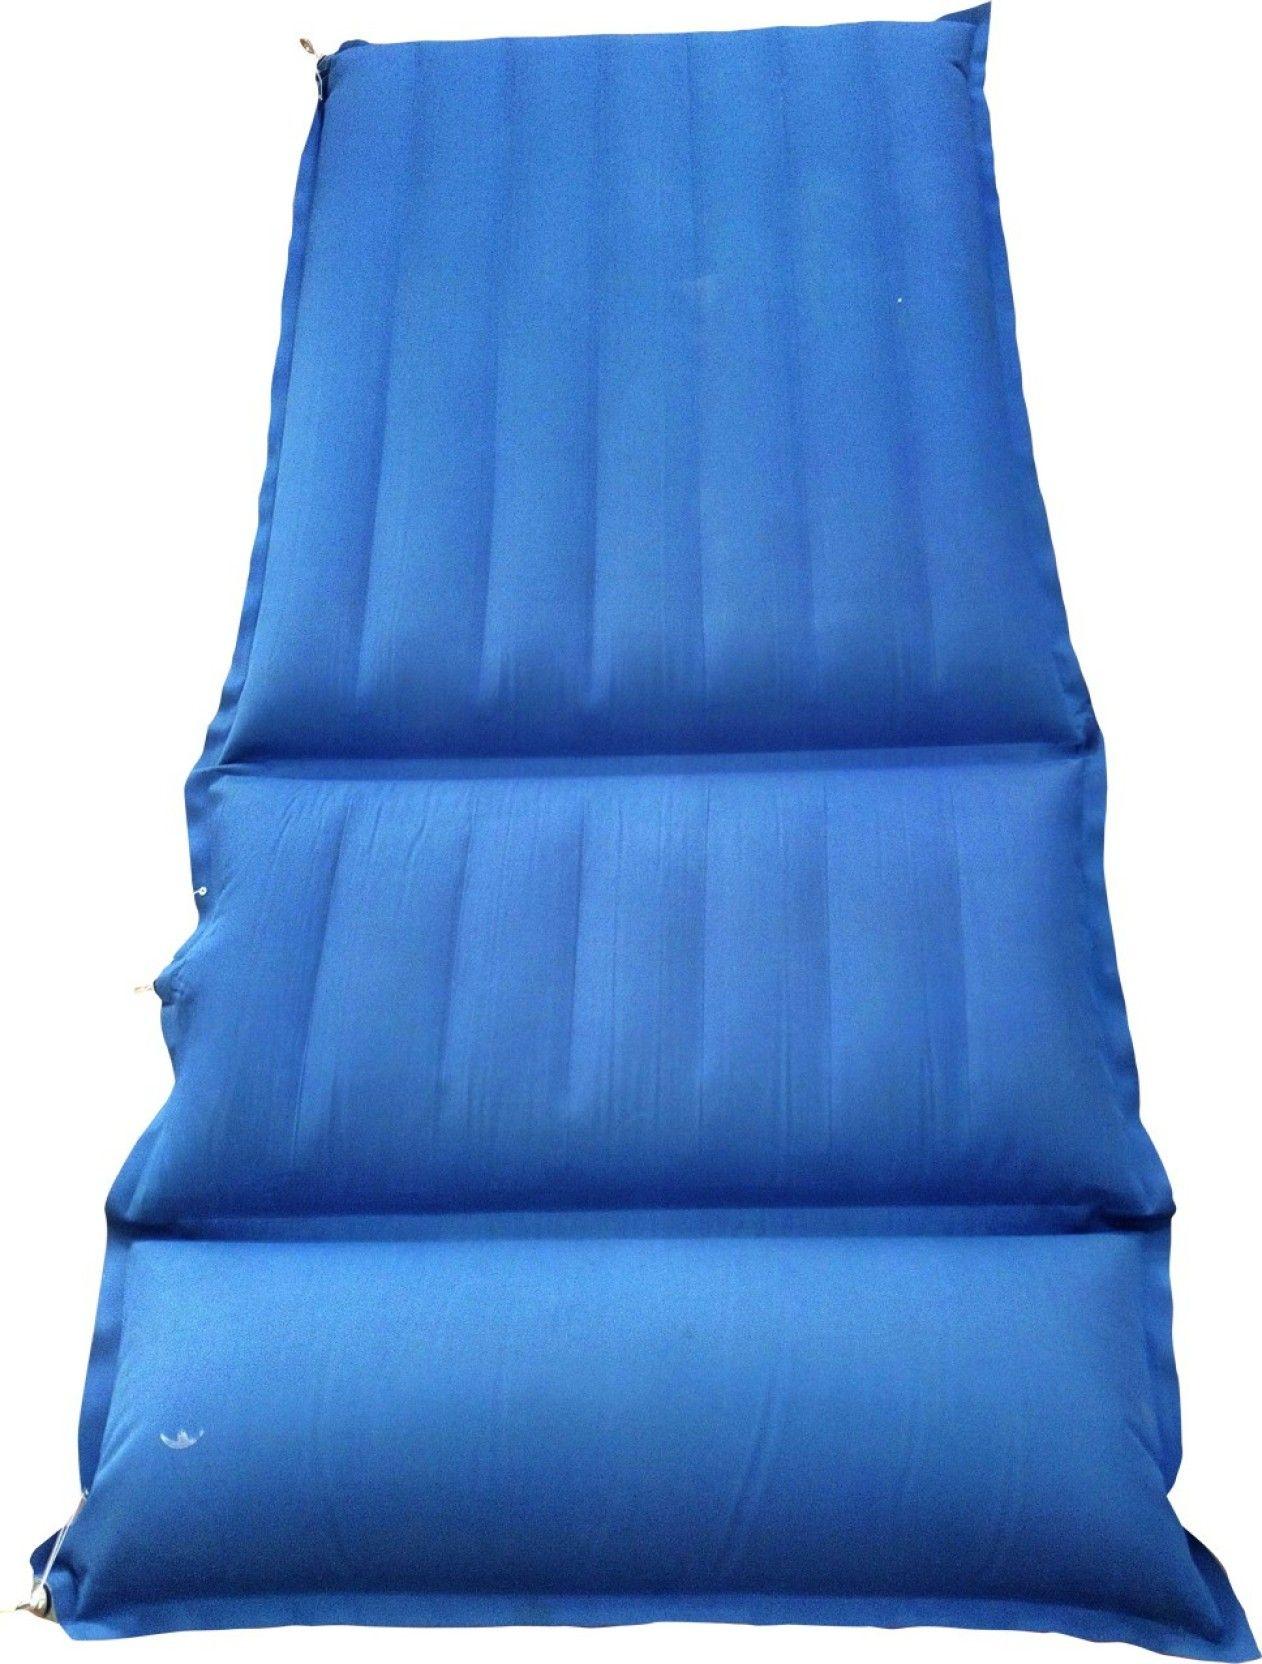 Healthgenie Water Bed Inflatable sofa, Sofa price, Sofa